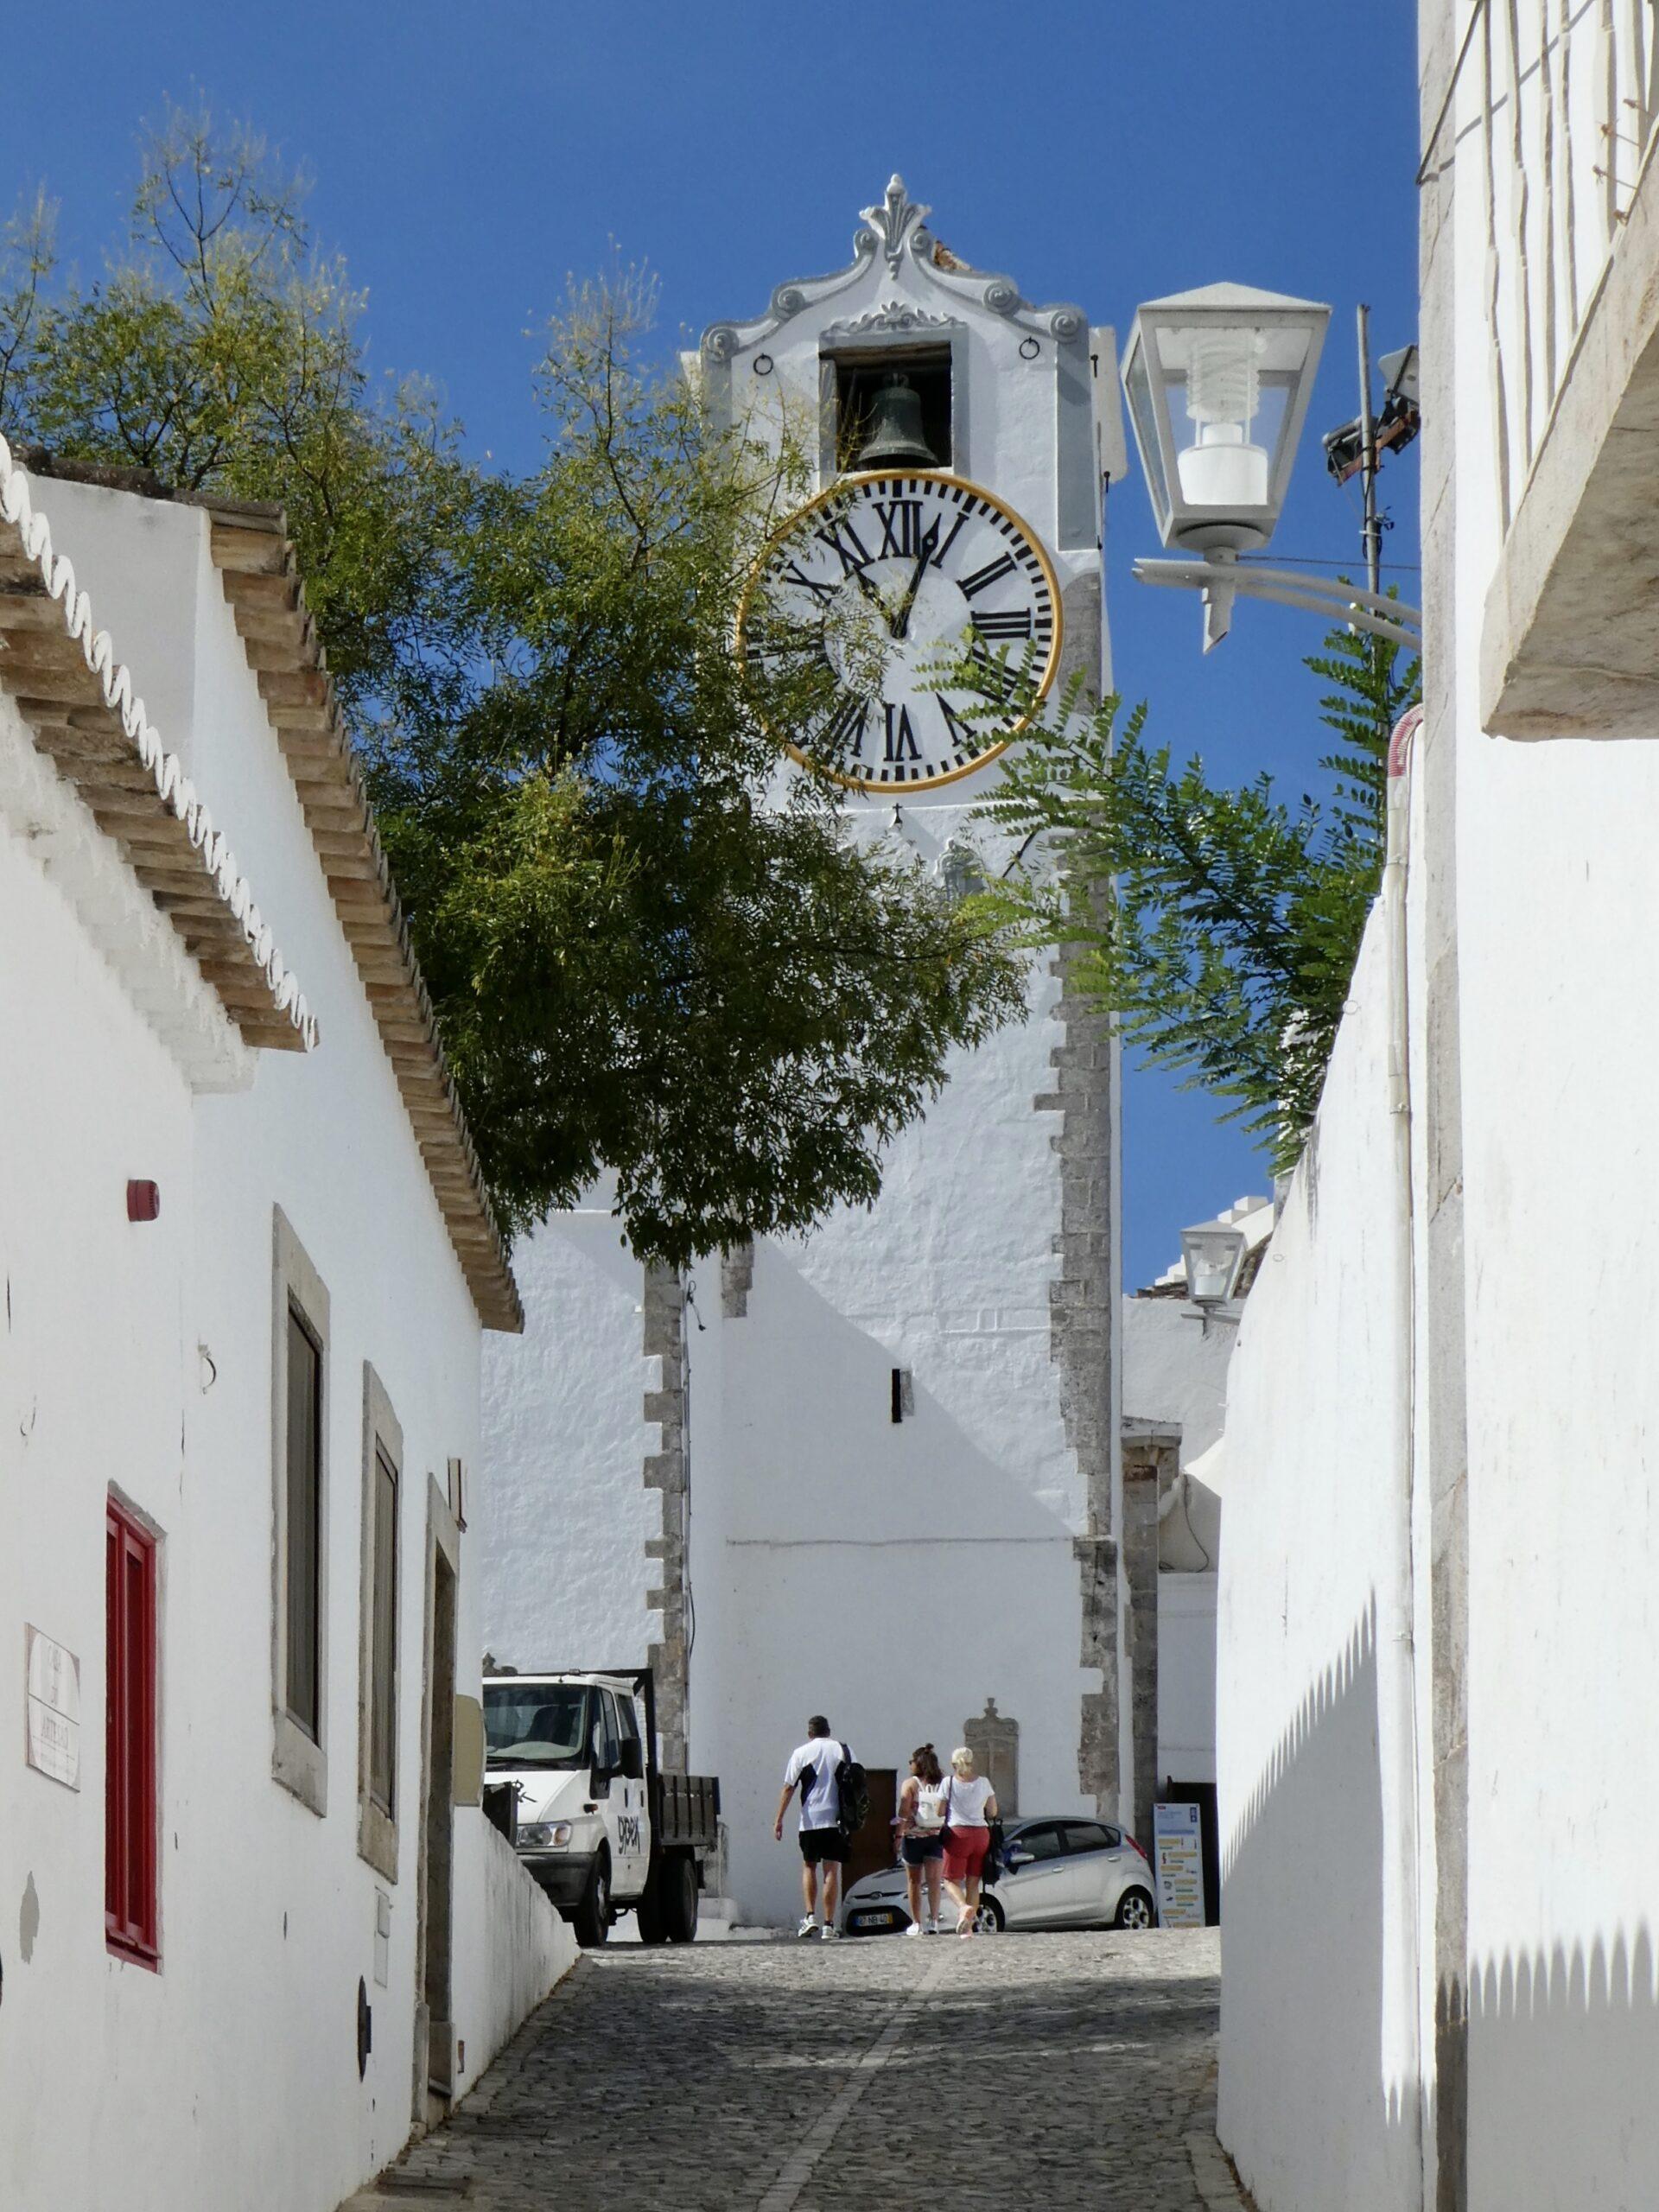 Tavira Old Town